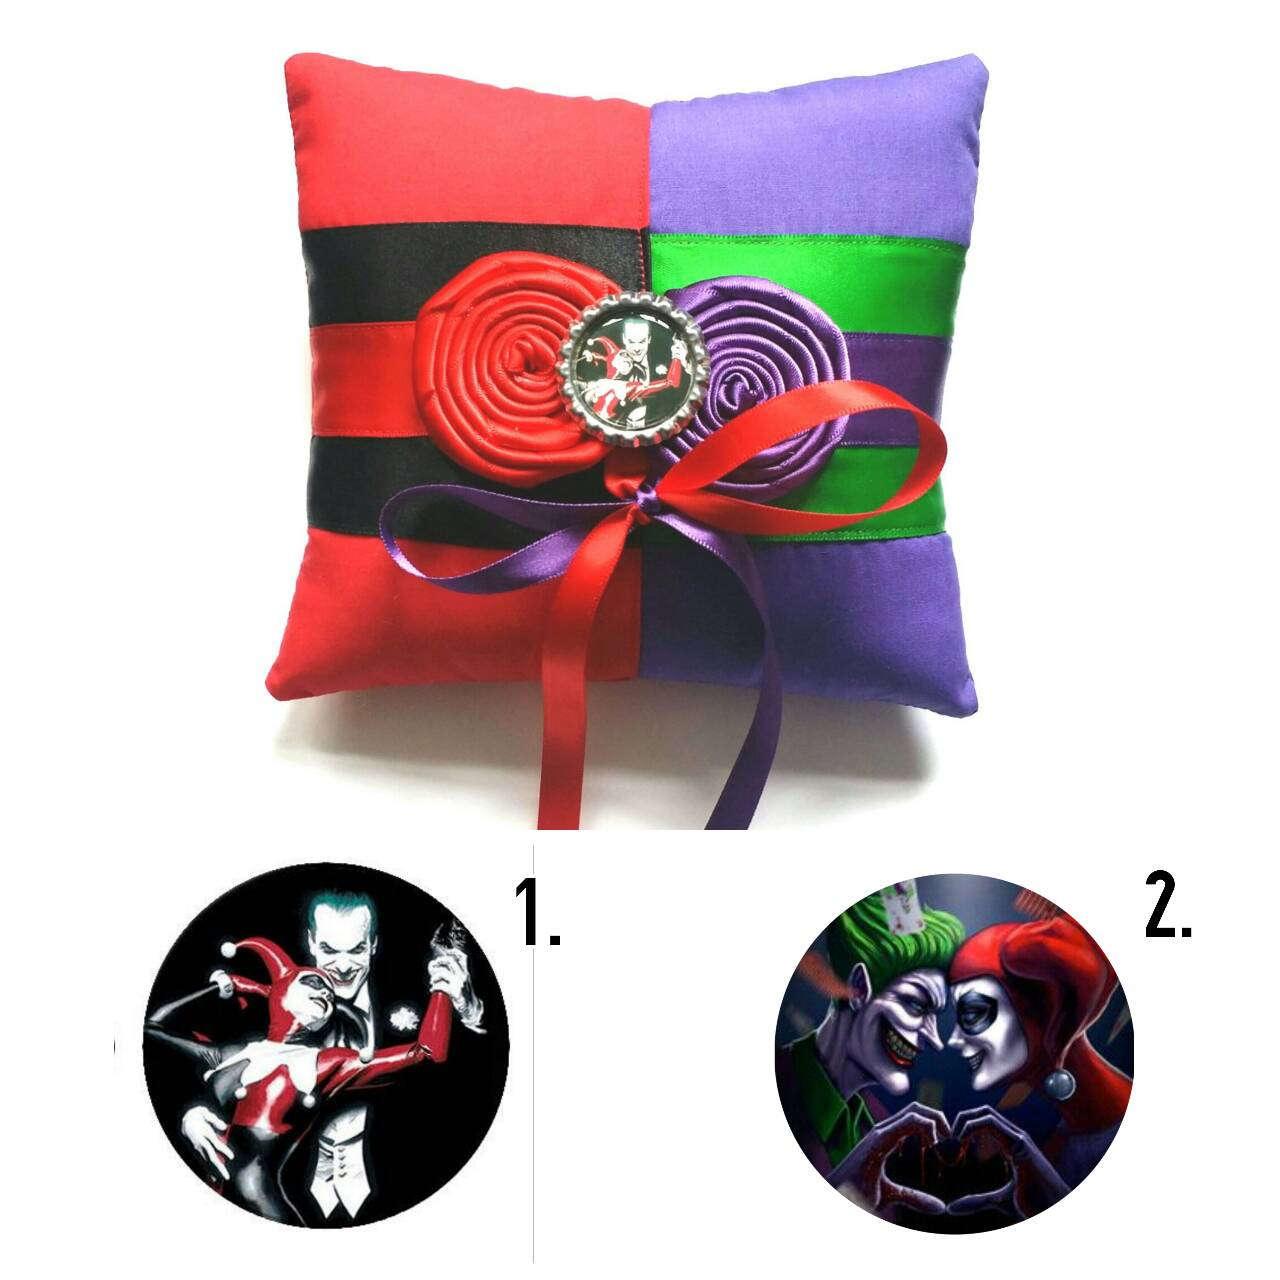 Harley Quinn And The Joker Half N Half Wedding Ring Pillow(6x6 Inch Pillow